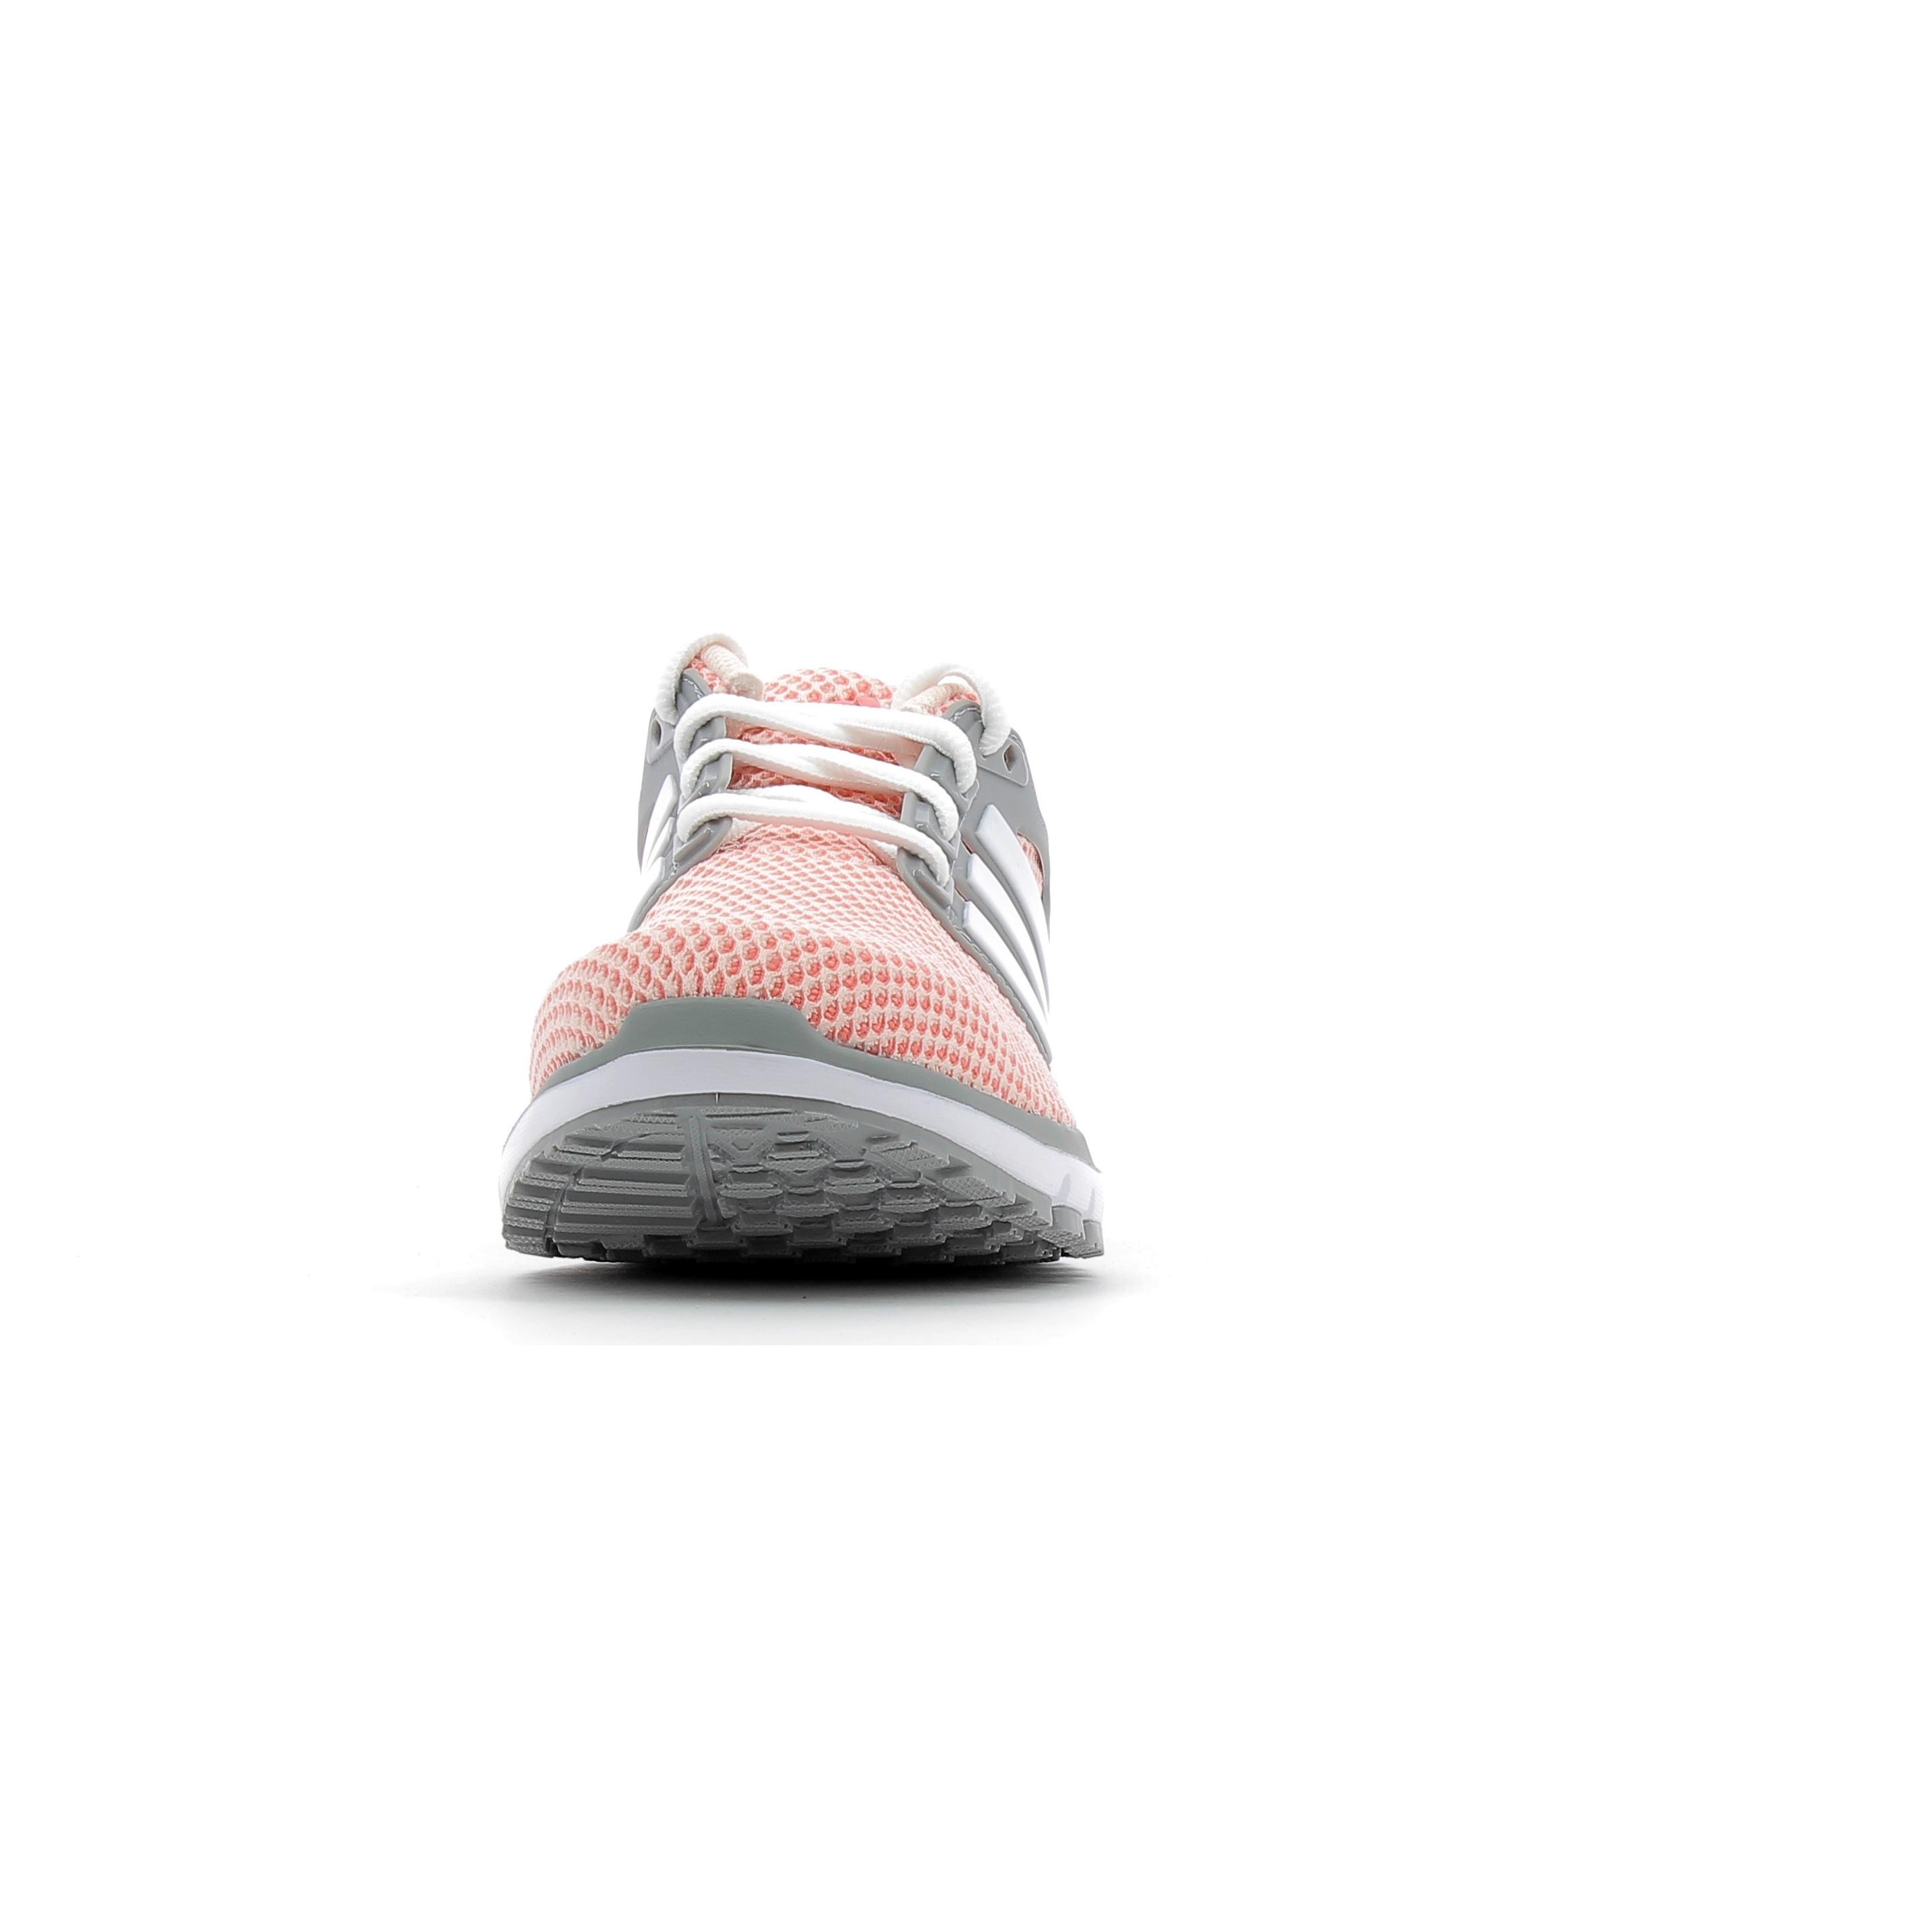 outlet store 0a1cc 58696 Chaussures de Running Femme adidas running Energy Cloud W Rose